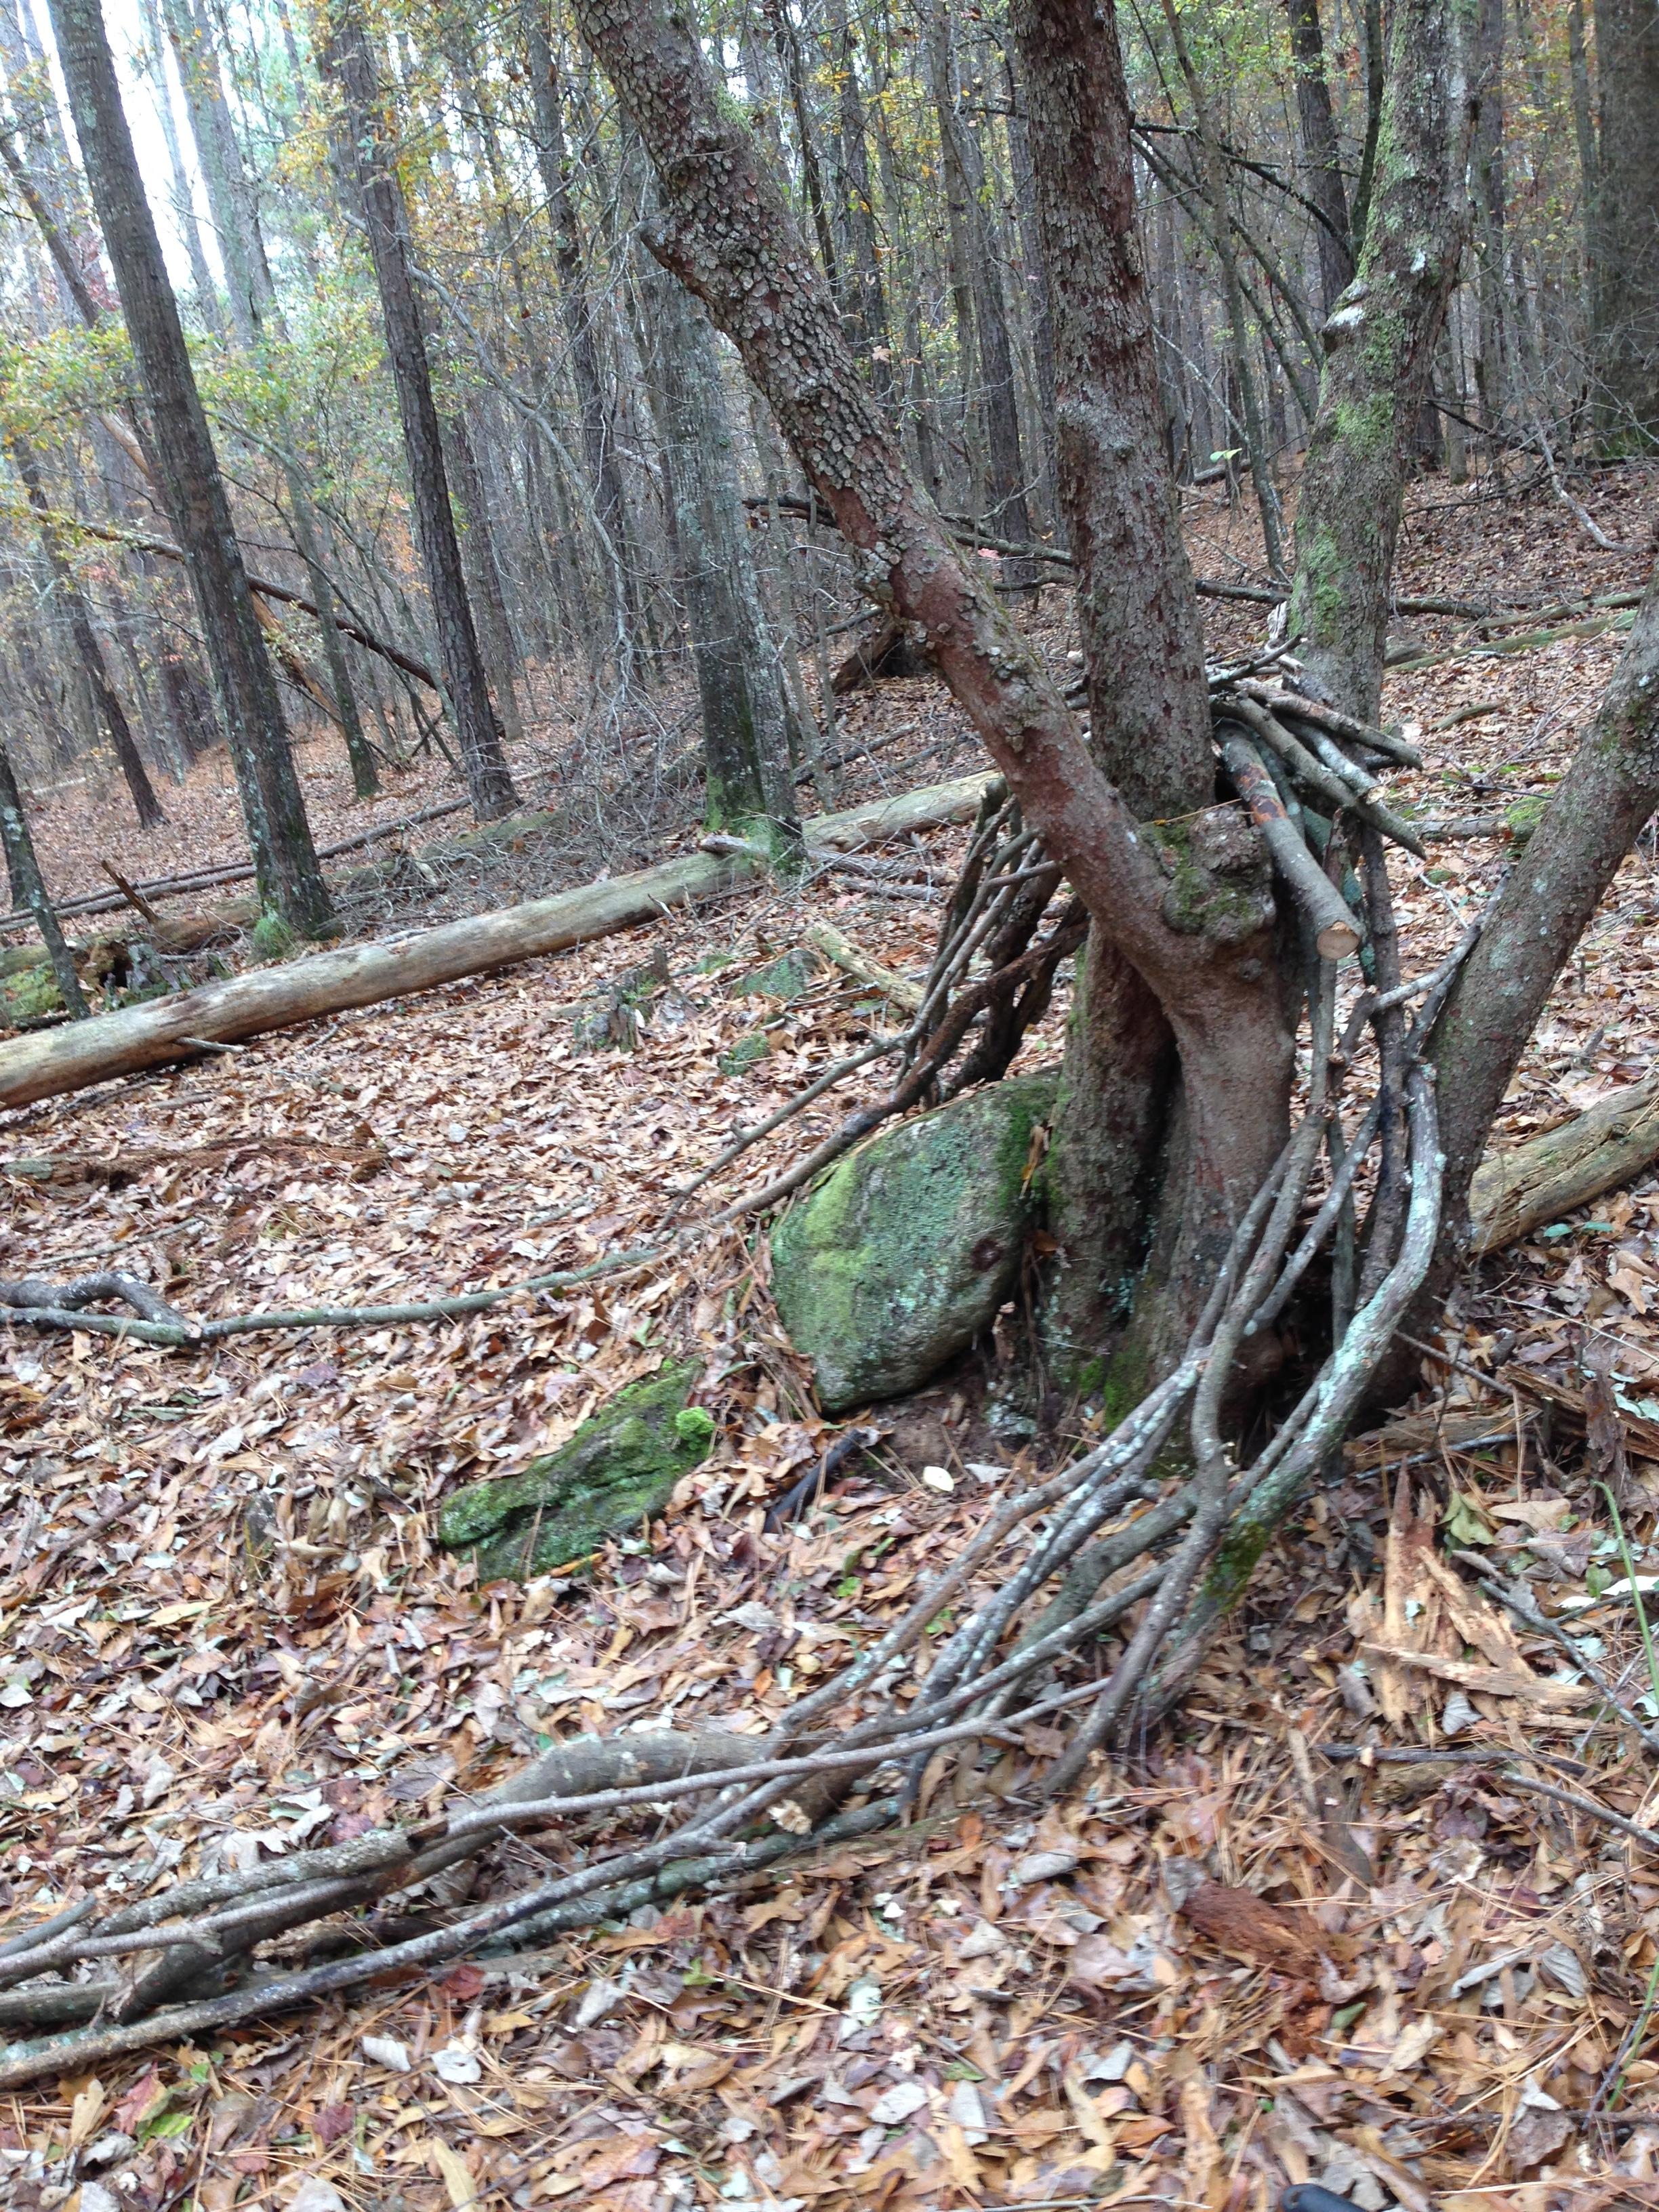 Wood flow. Sandy Creek Park. Athens, GA. Fall 2013.